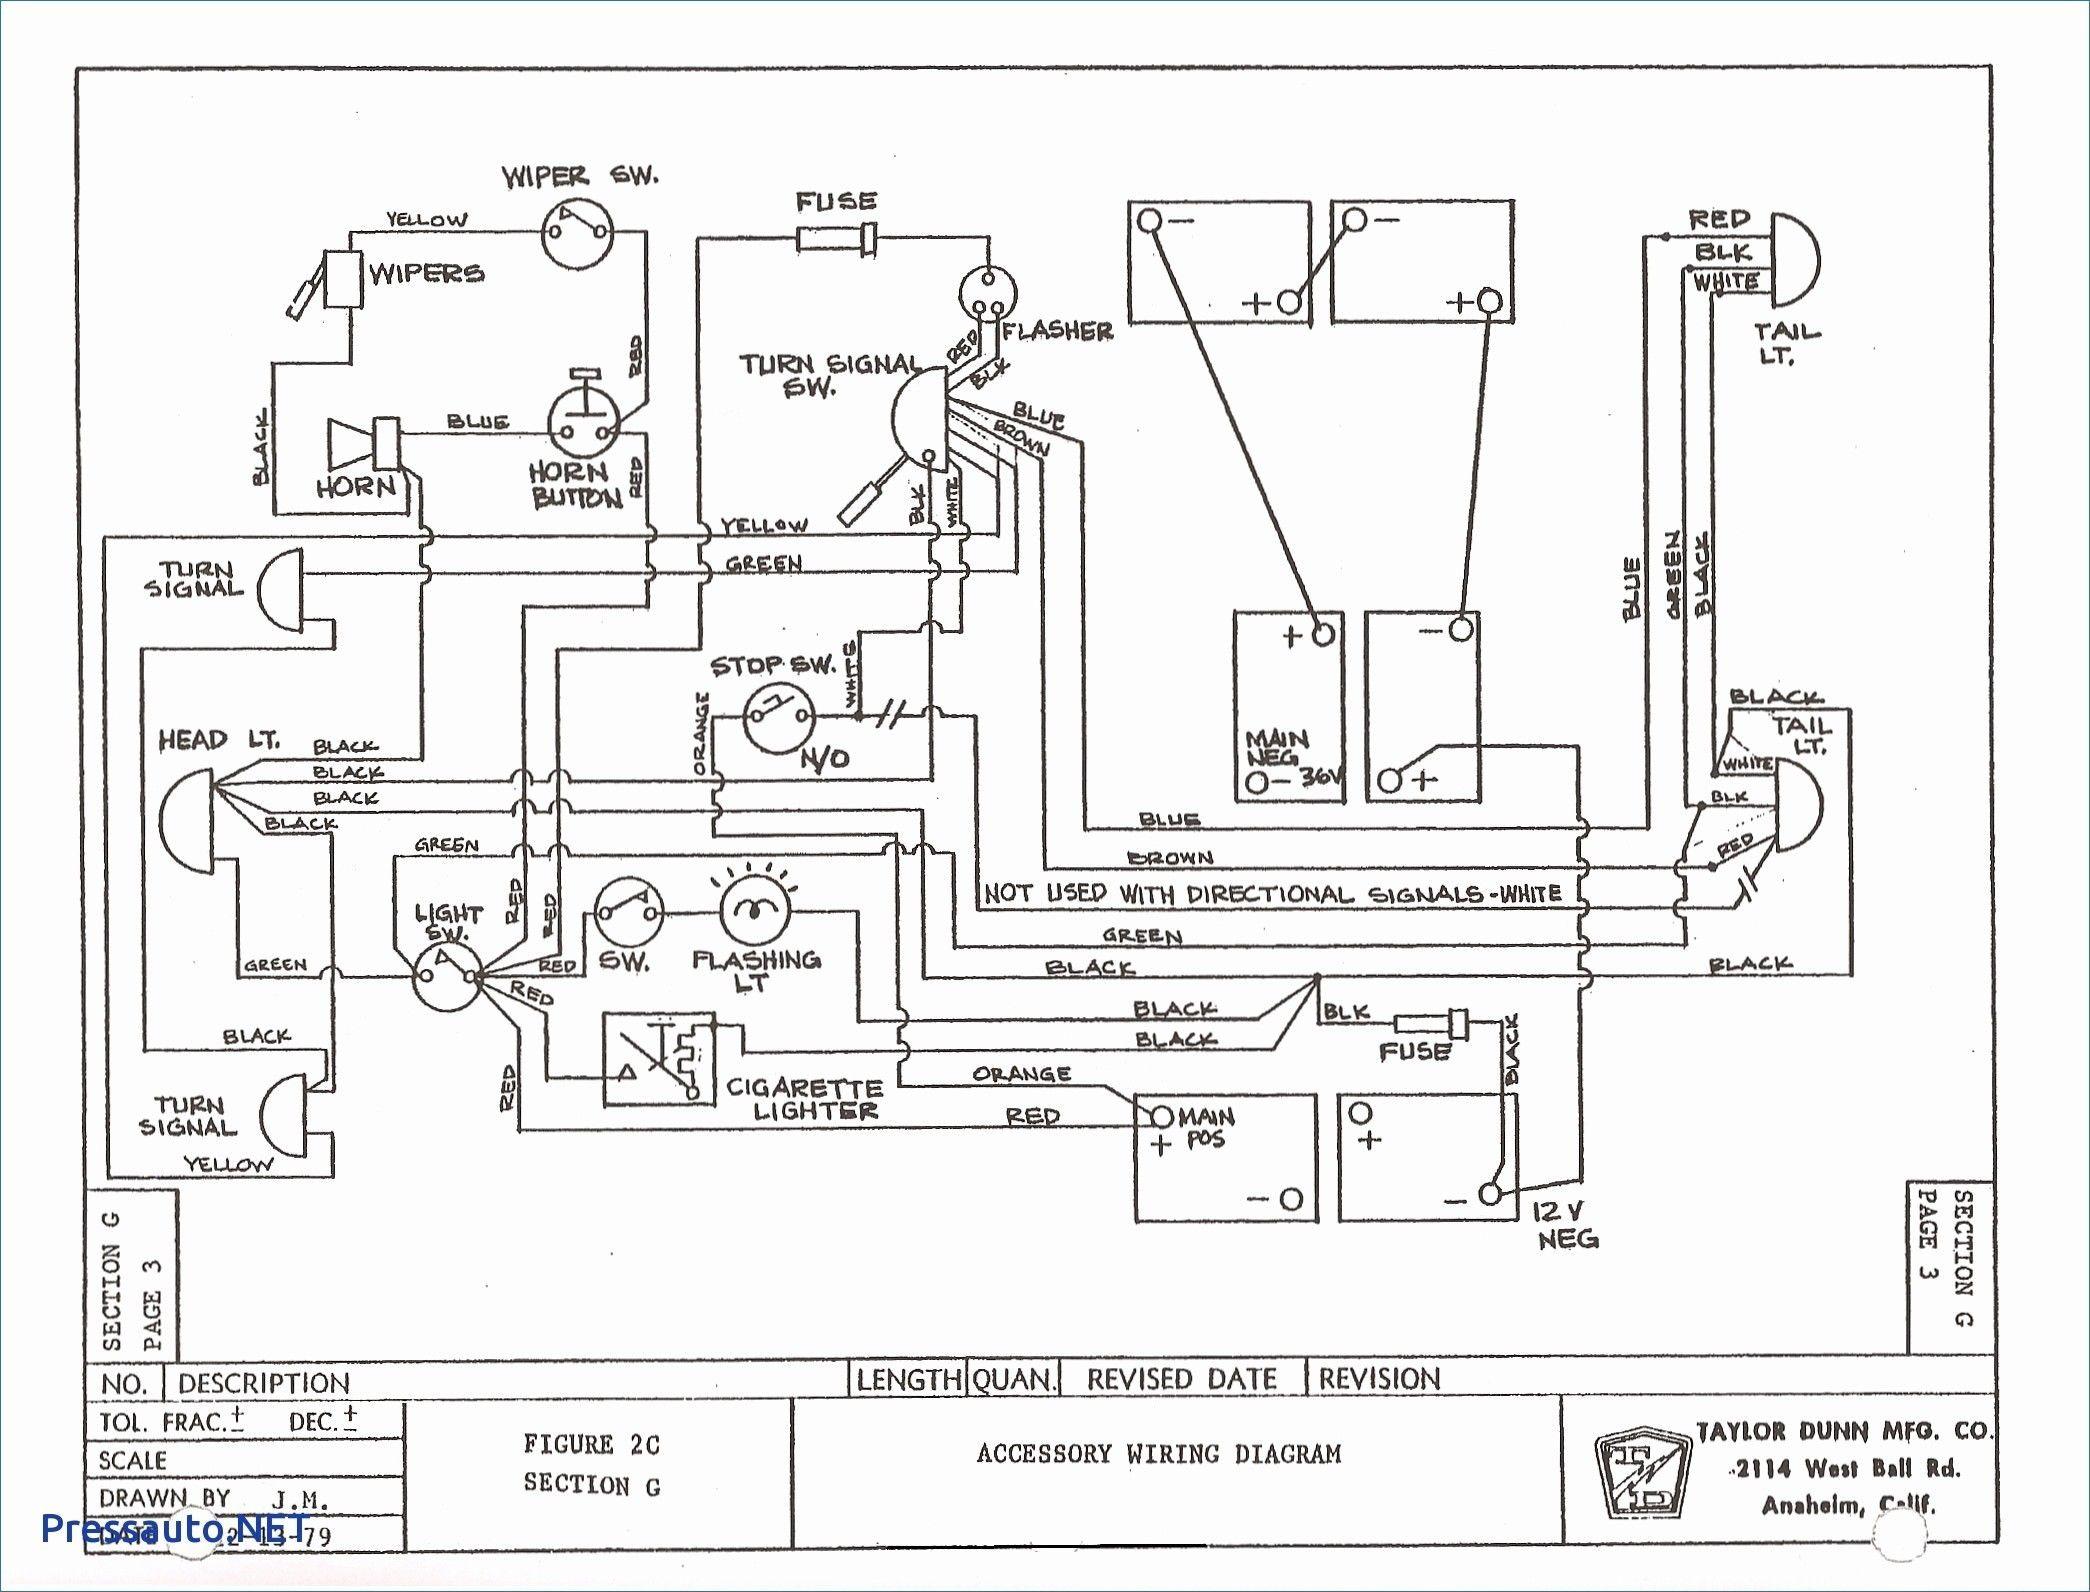 Unique Wiring Diagram Starter Generator Diagram Diagramtemplate Diagramsample Plano Electrico Carrito De Golf Planos